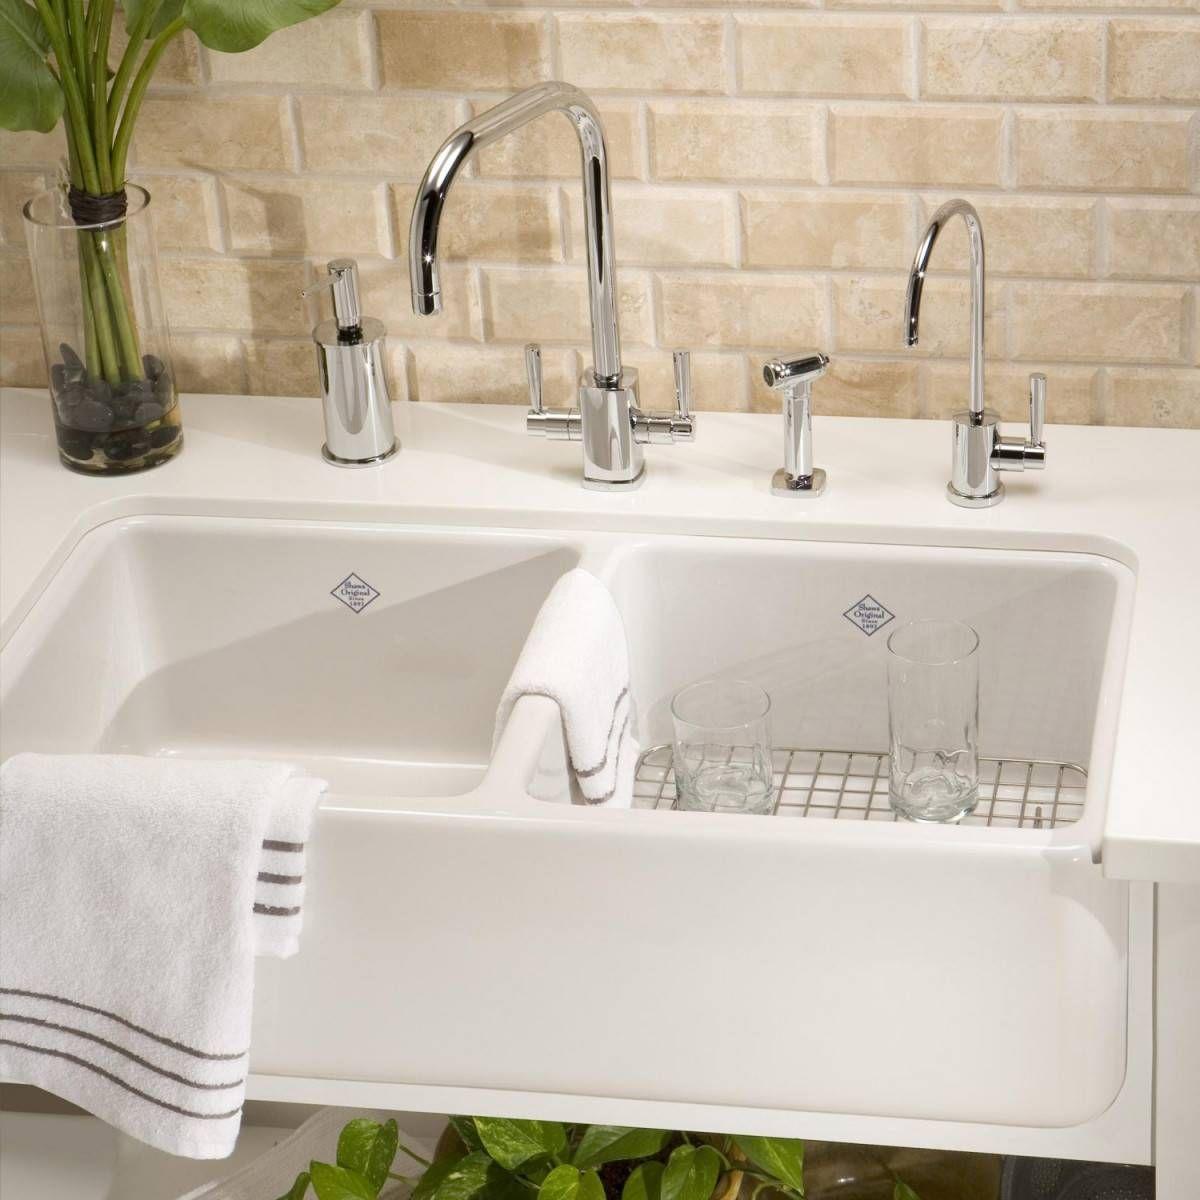 butler sink farmhouse apron kitchen sinks